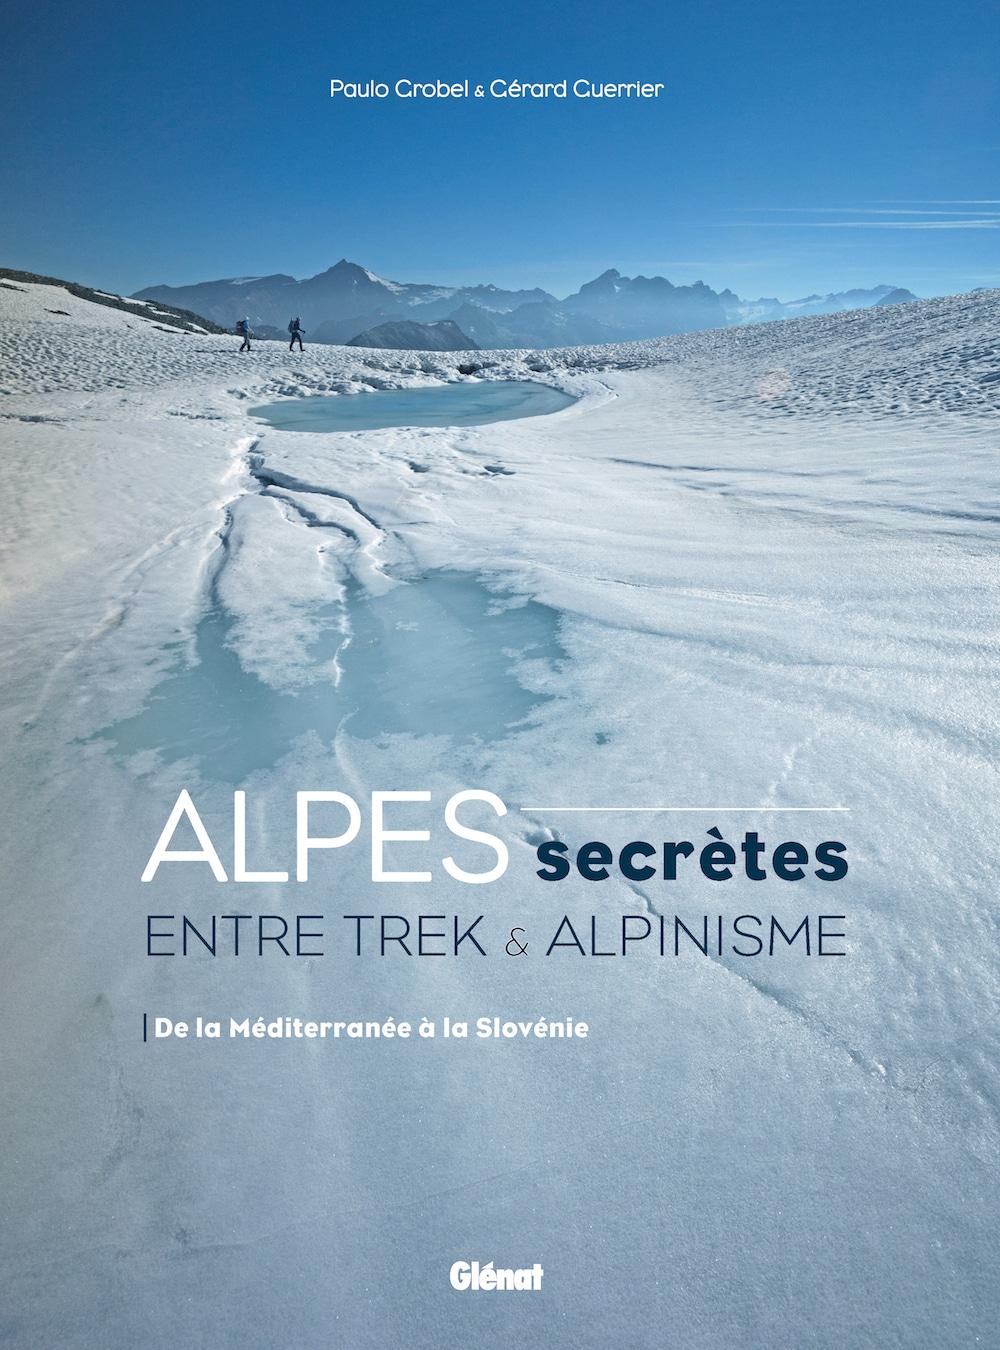 Alpes secrètes : entre trek et alpinisme